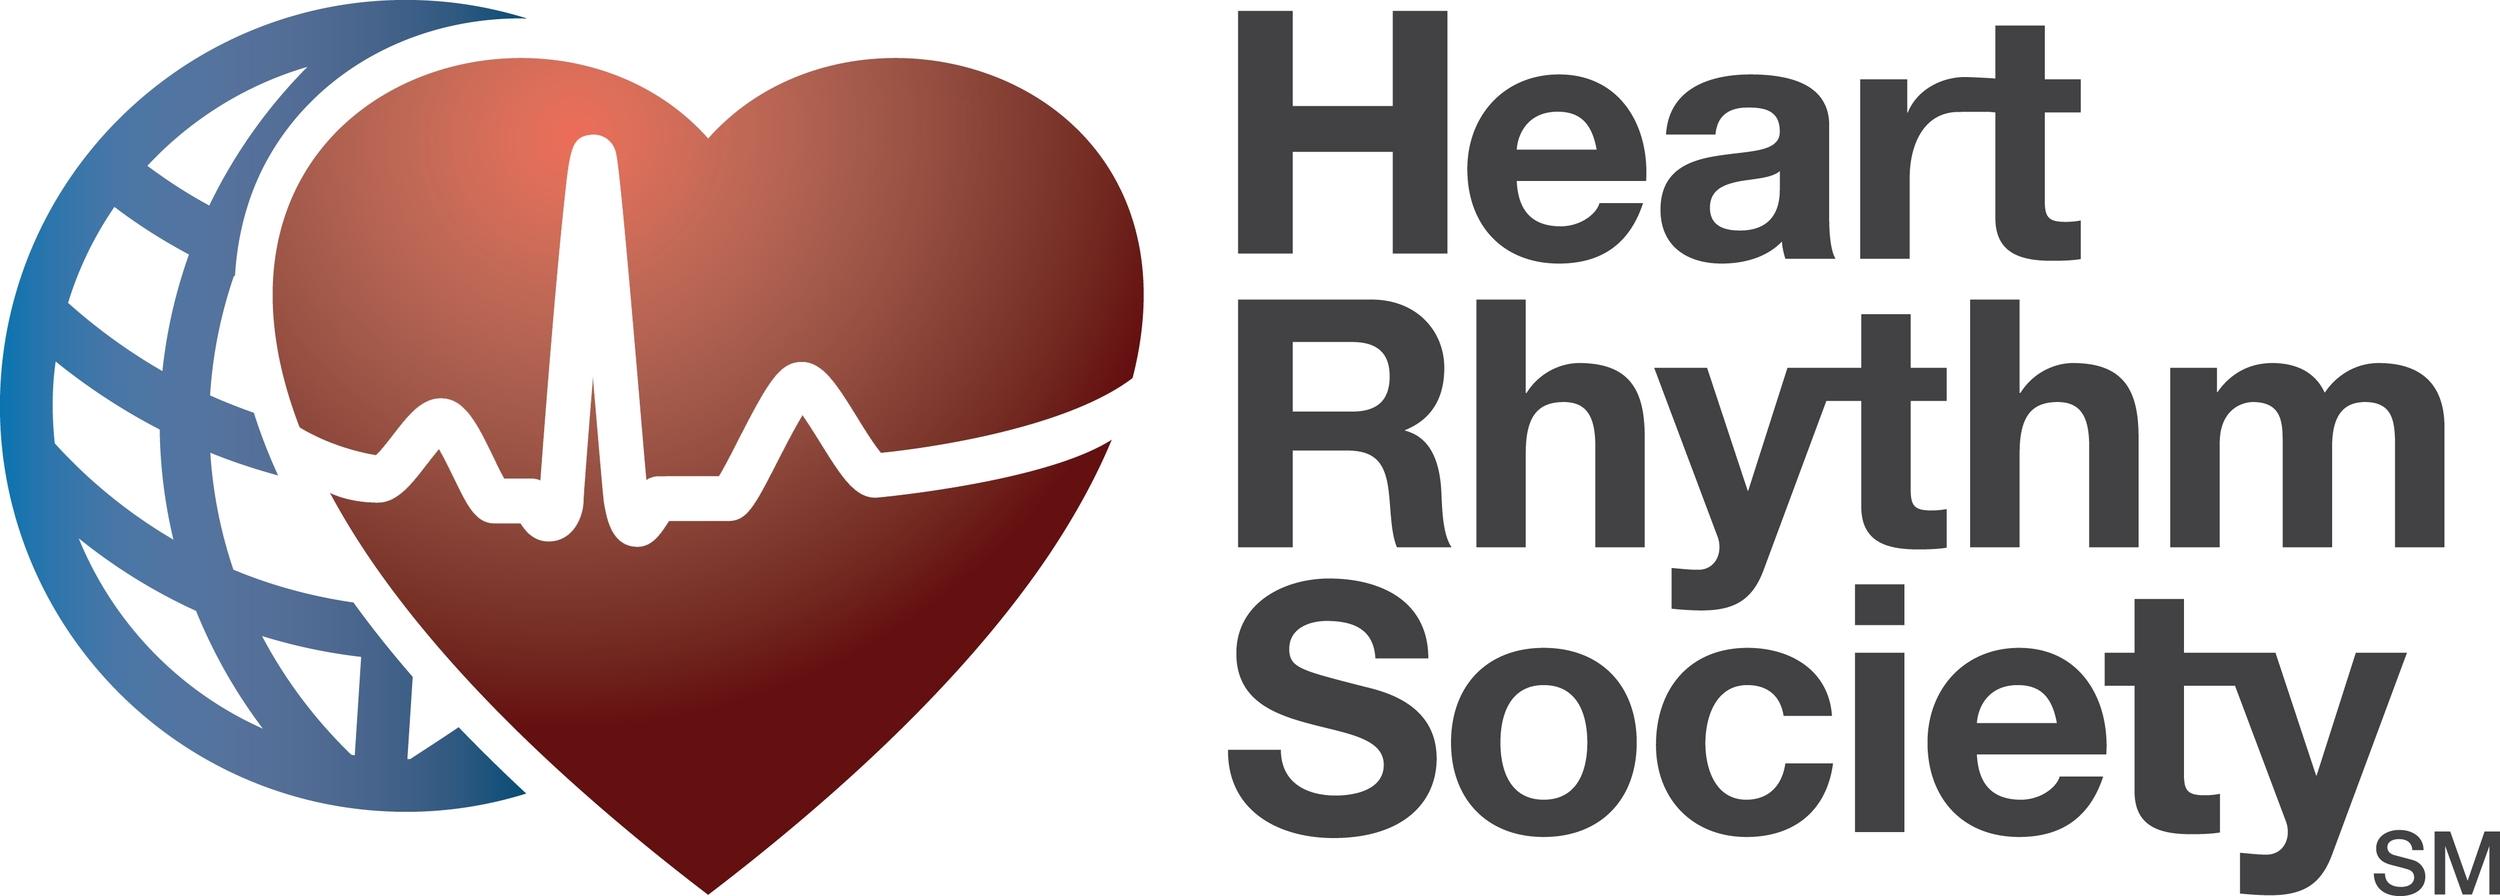 Heart-rhythm-society-Logo.jpg